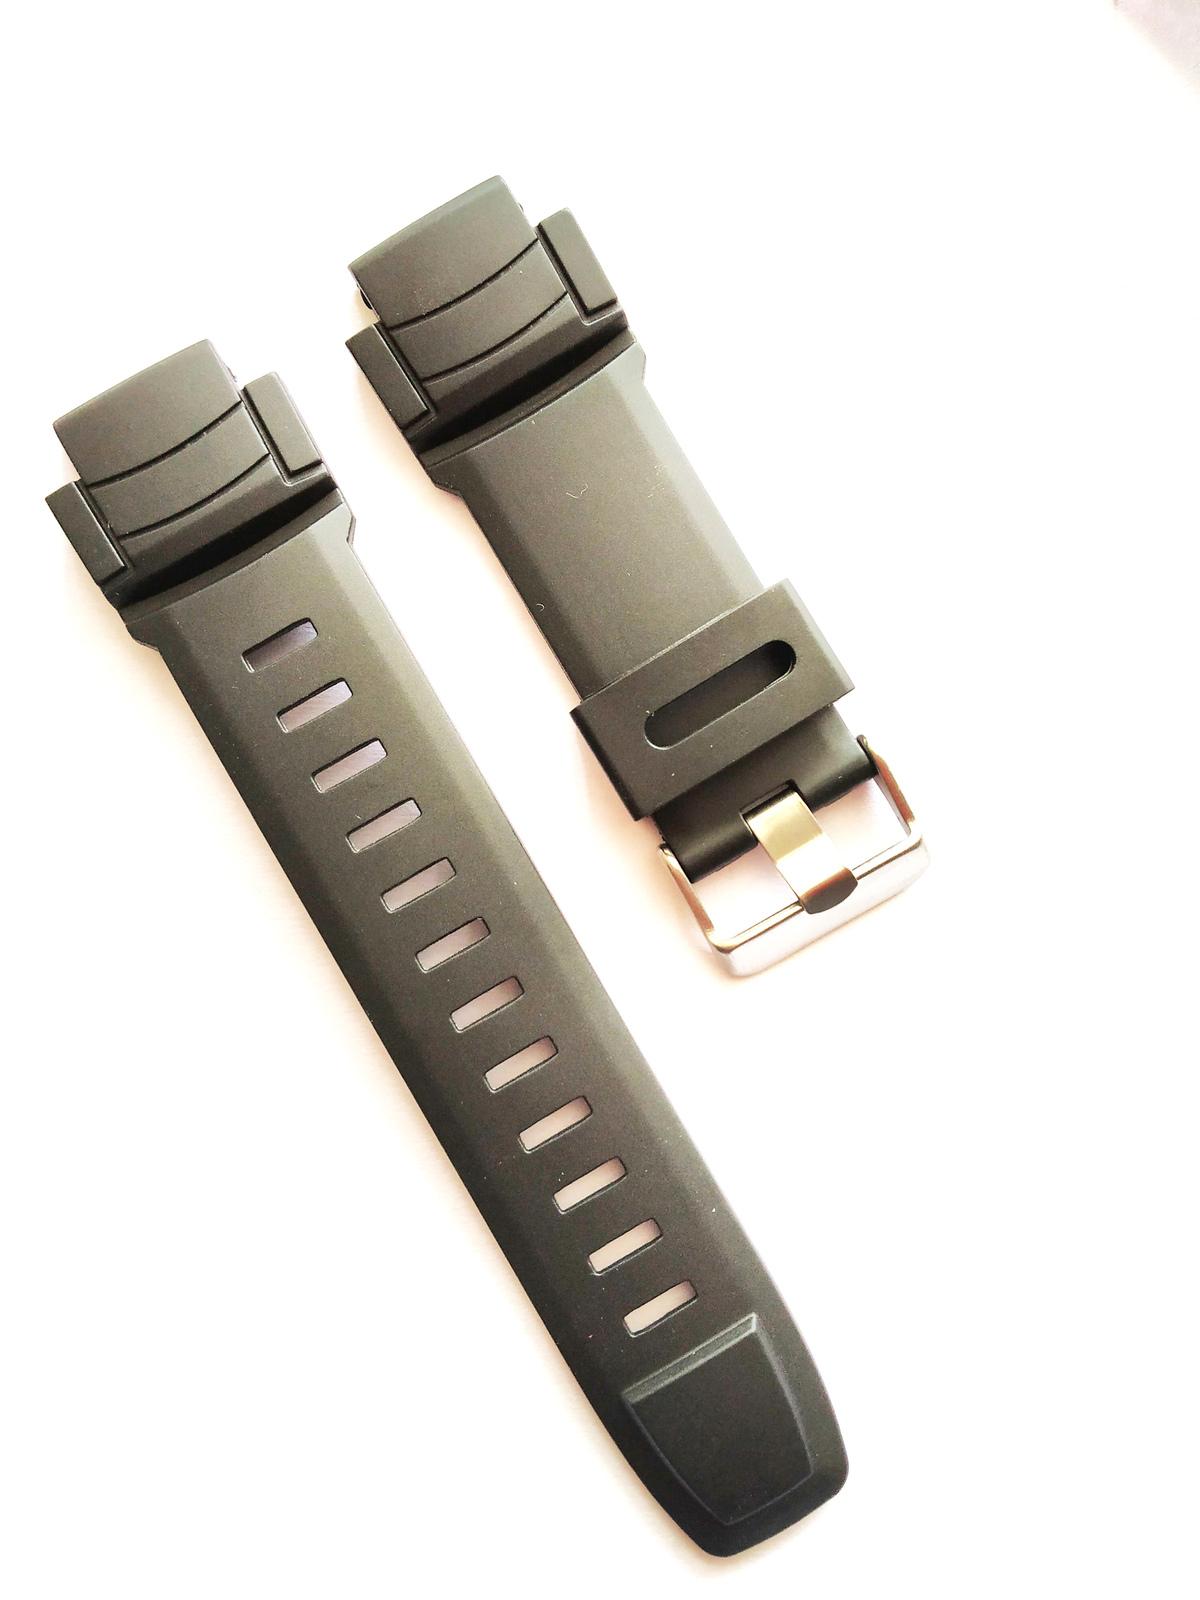 New Genuine Casio Pro Trek Black Resin Replacement Strap PRW-2000-1 PRG-200-1